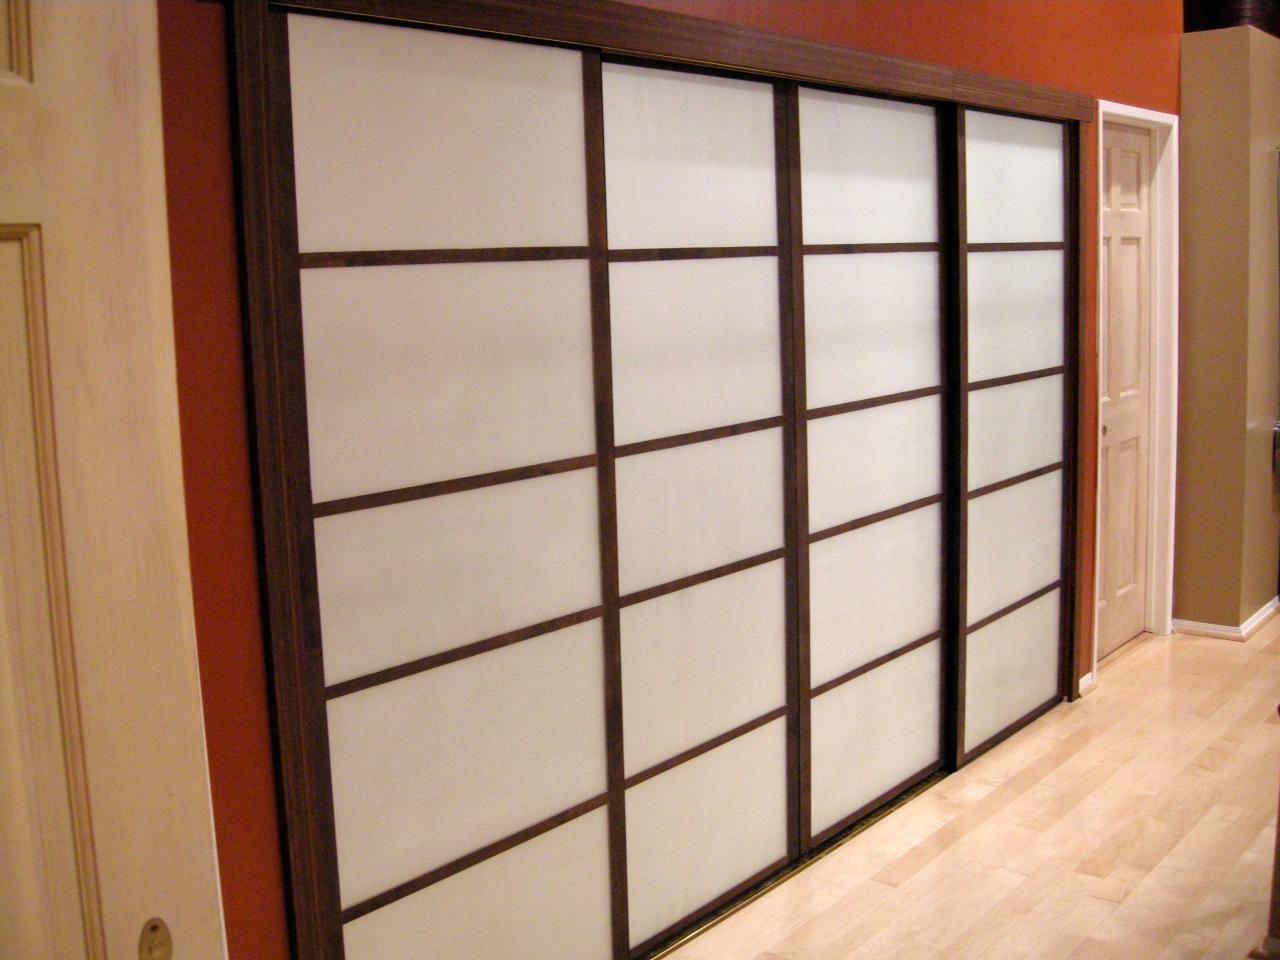 japanese shoji screens for sliding glass doors photo - 6